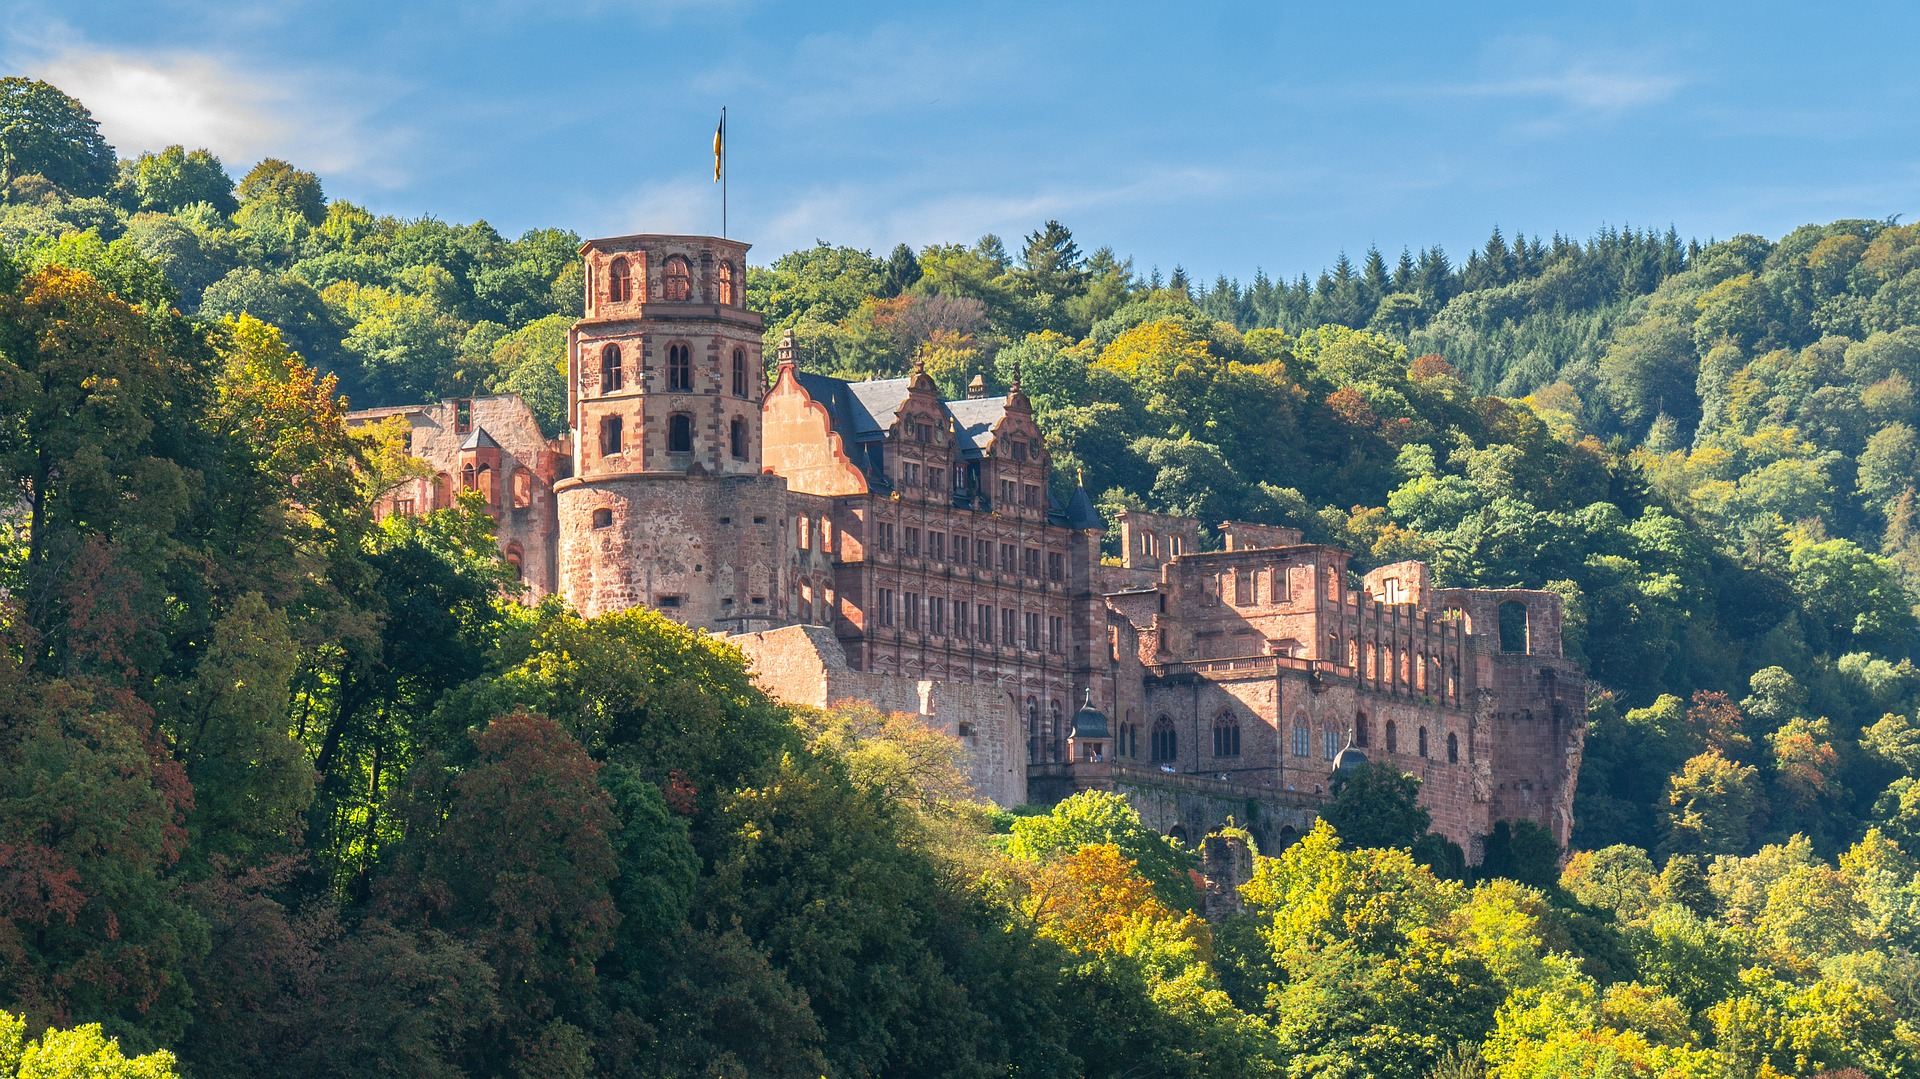 Alles über Sprinter mieten Heidelberg [Guide]